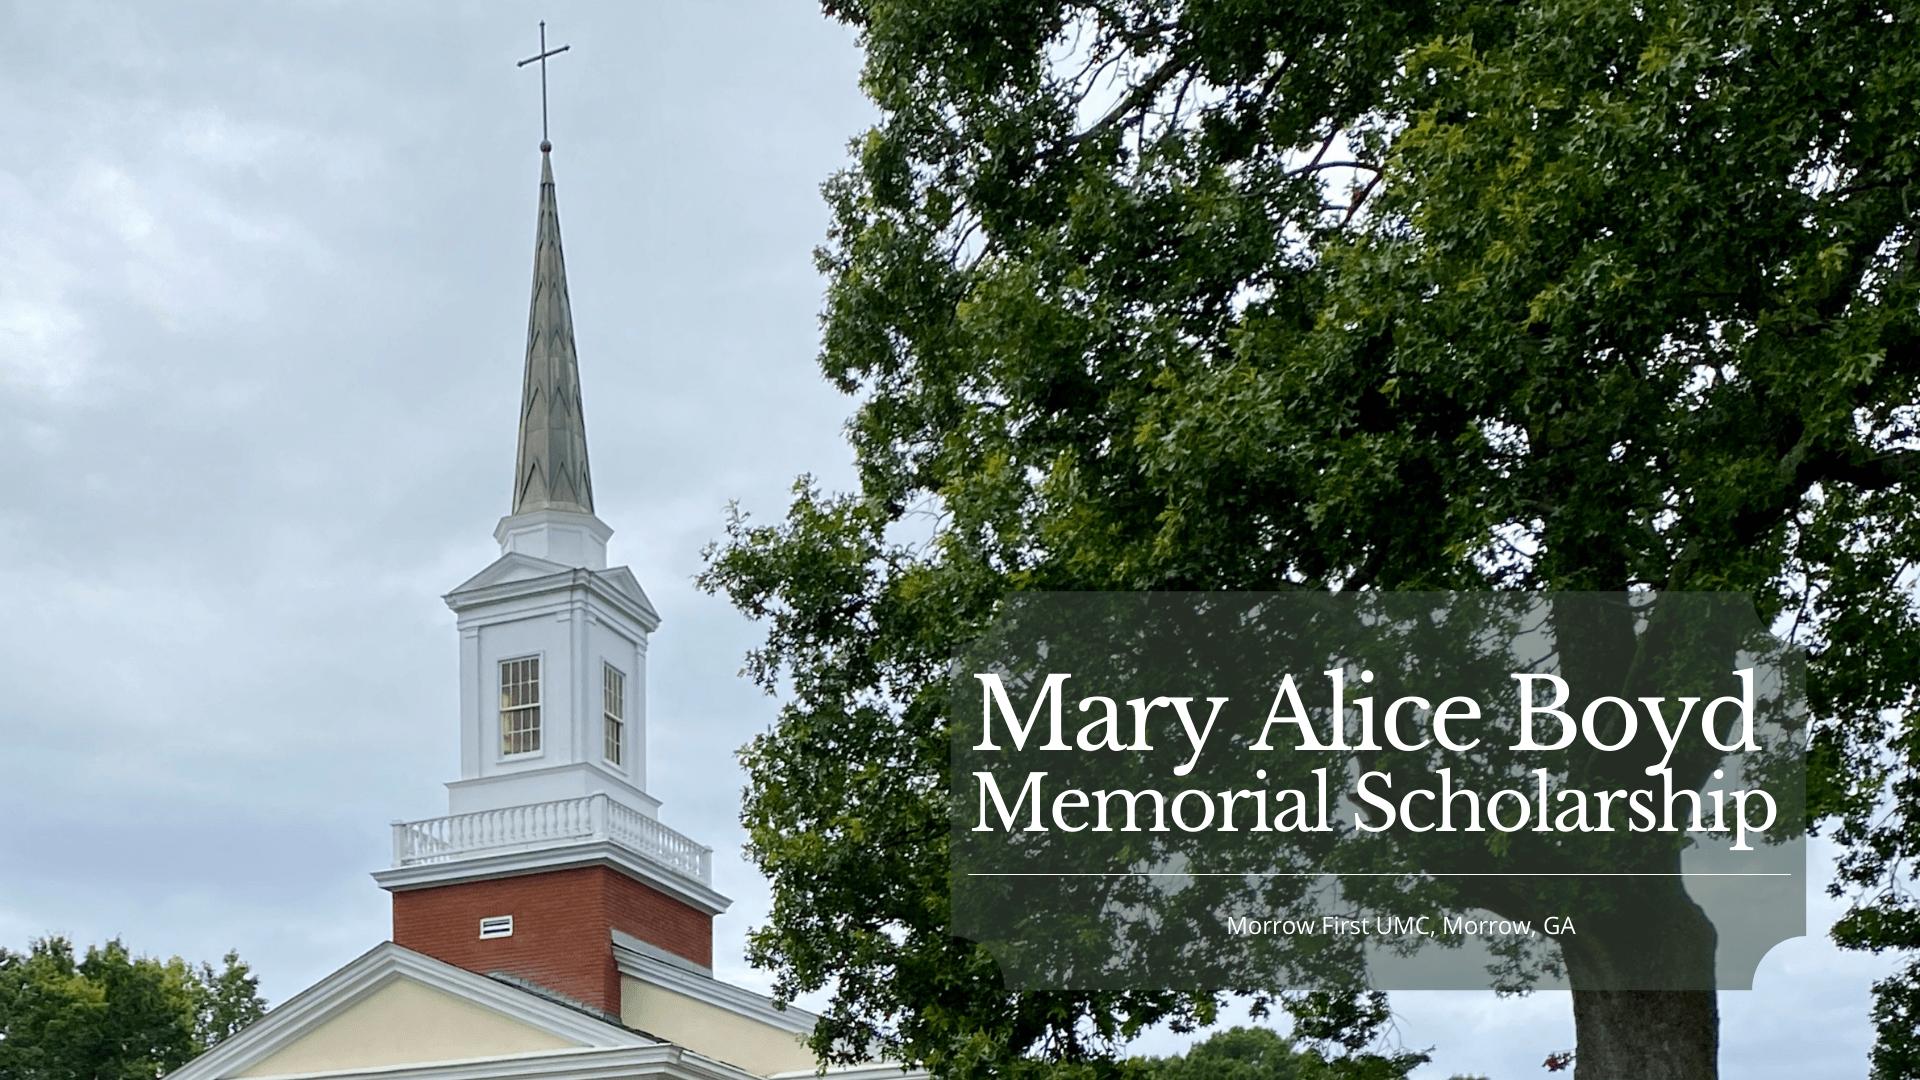 Mary Alice Boyd Memorial Scholarship Announcement